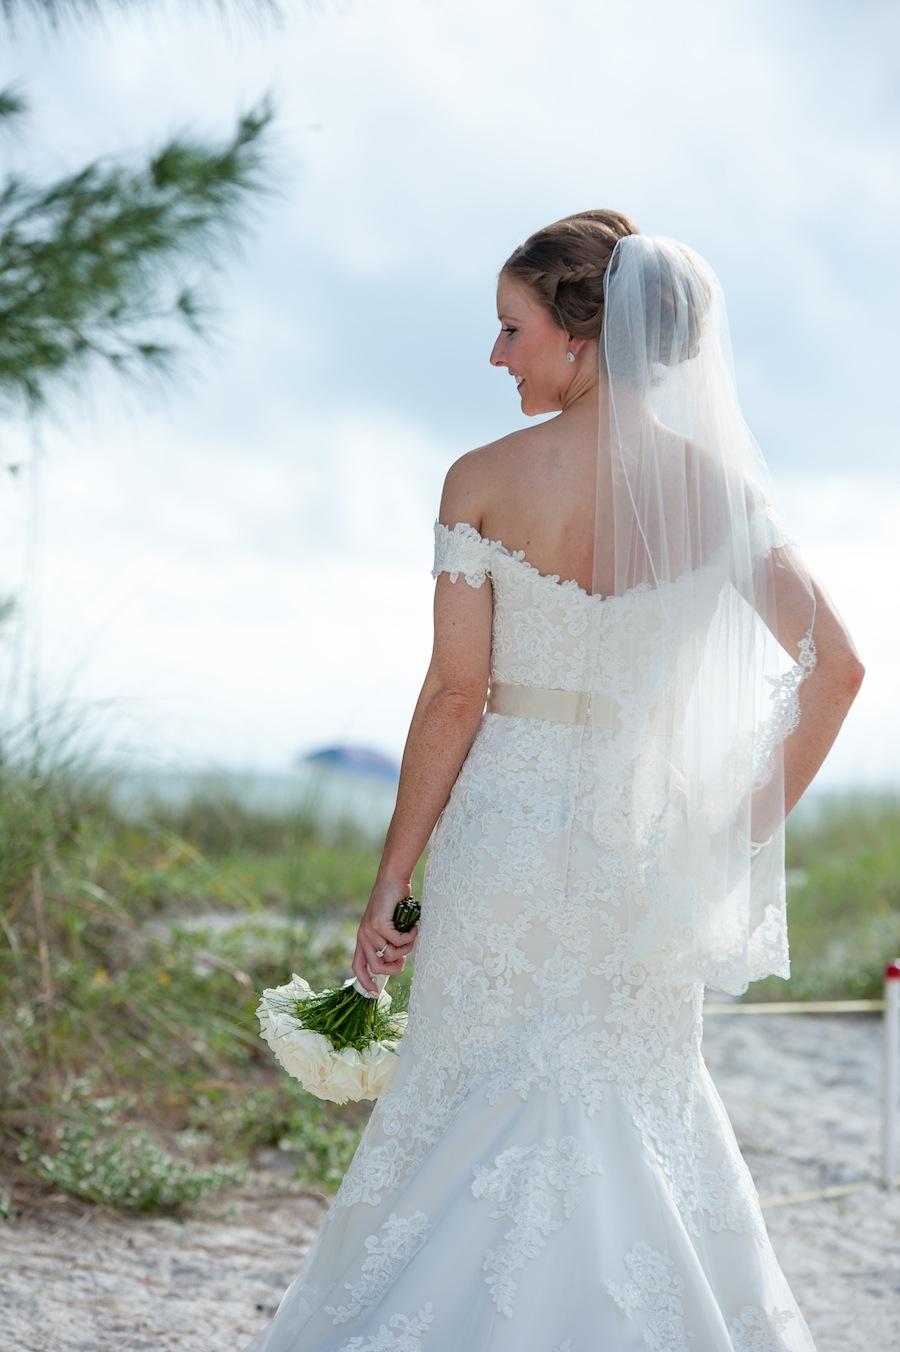 Beach Bridal Portrait | St. Pete Wedding Photographer Essentia Photography